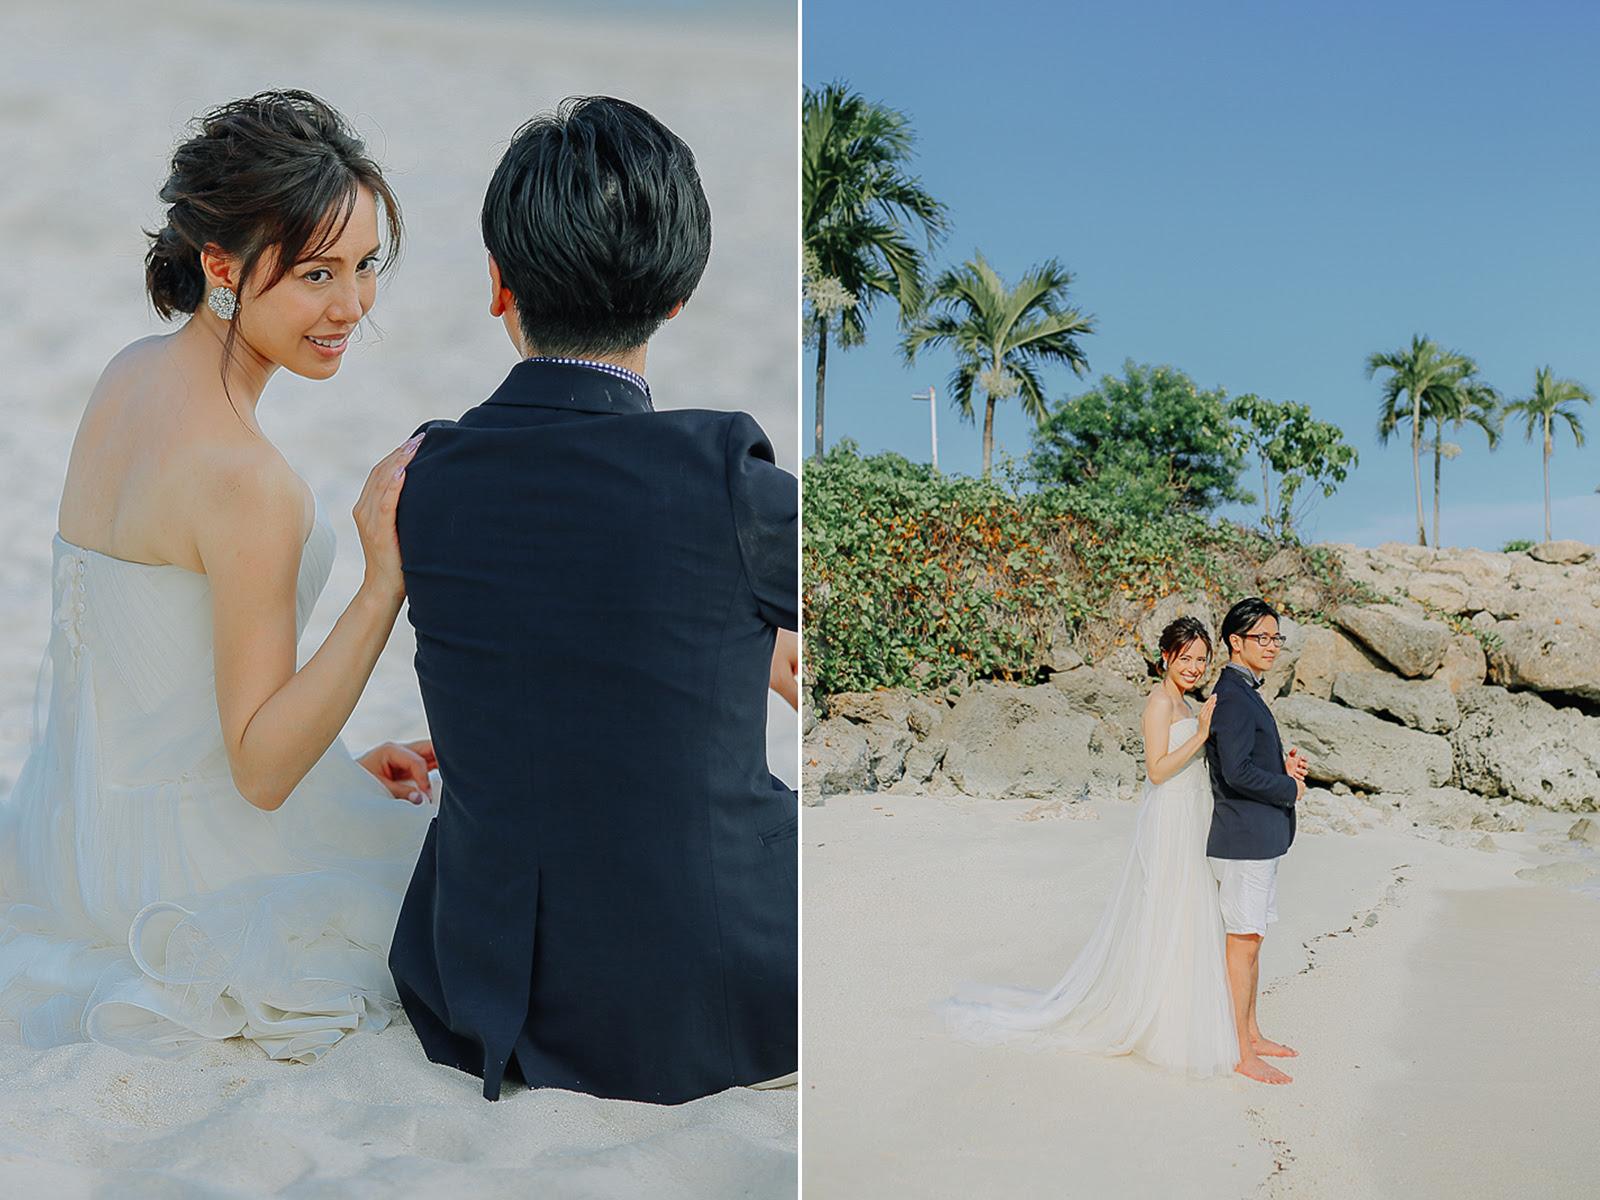 Shangri-la Cebu Beach Wedding